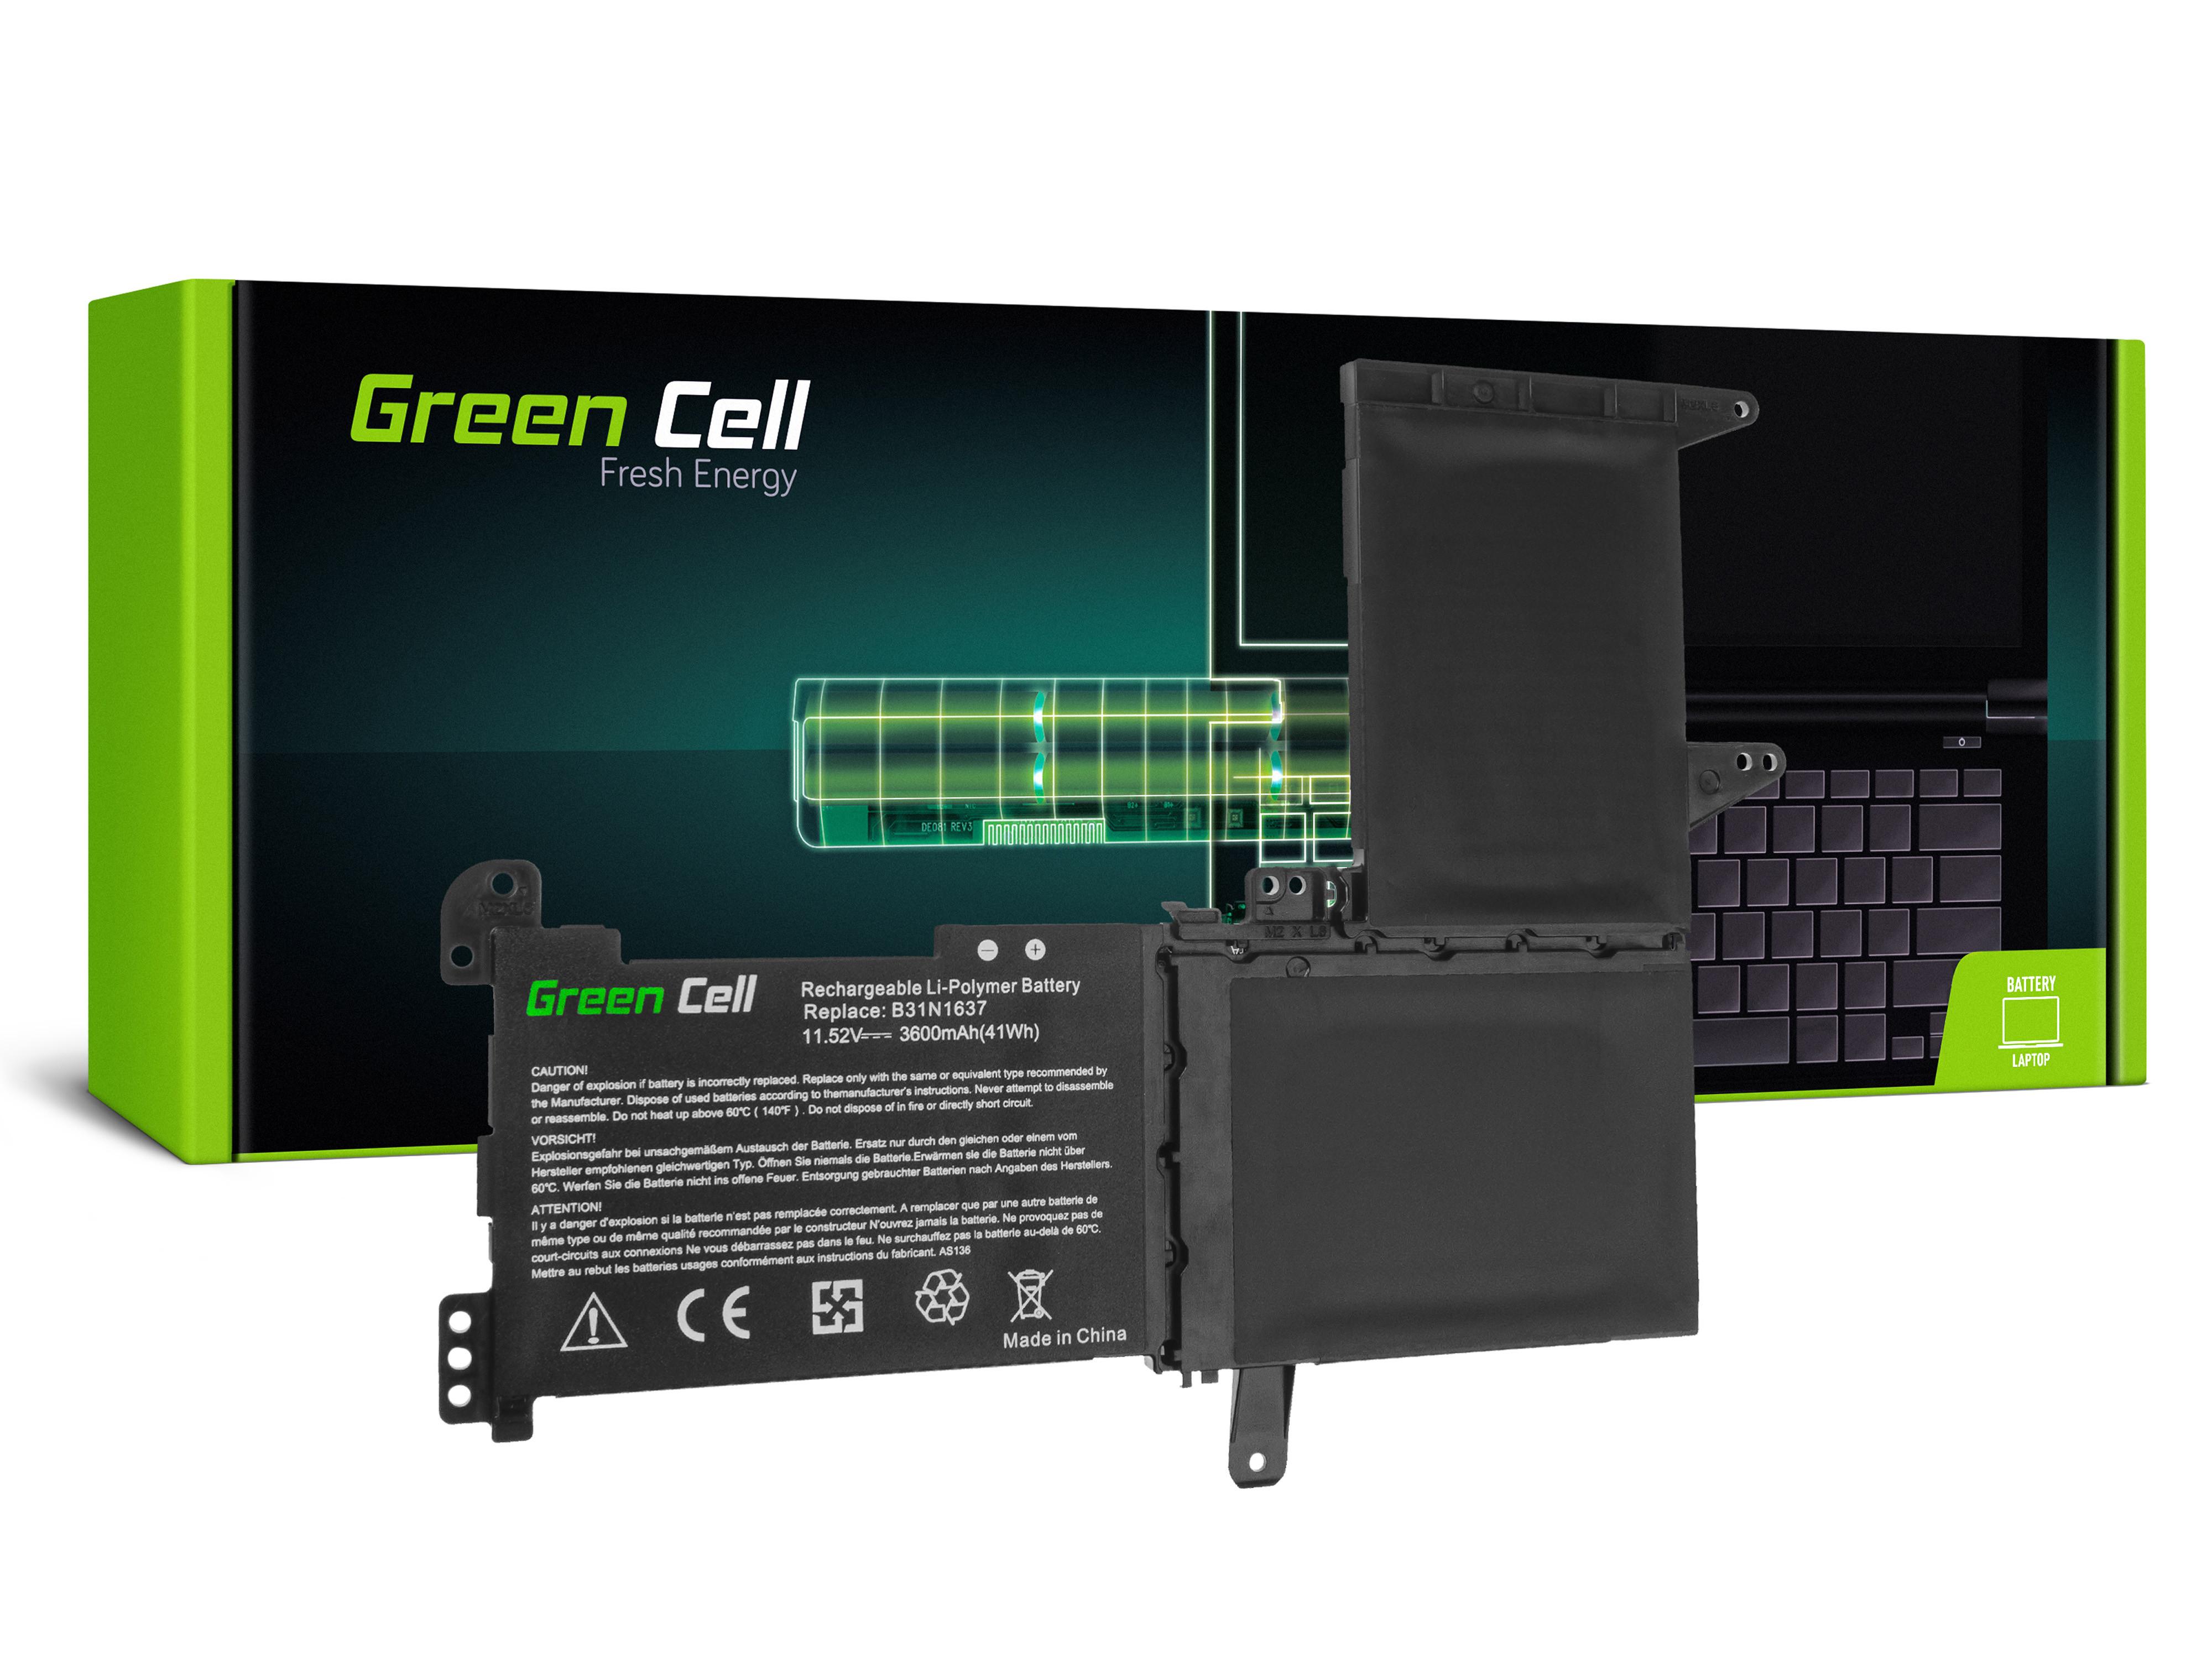 Green Cell B31N1637 C31N1637 Baterie pro Asus VivoBook S15 S510 S510U S510UA S510UN S510UQ 15 F510 F510U F510UA / 11,52V 3600mAh